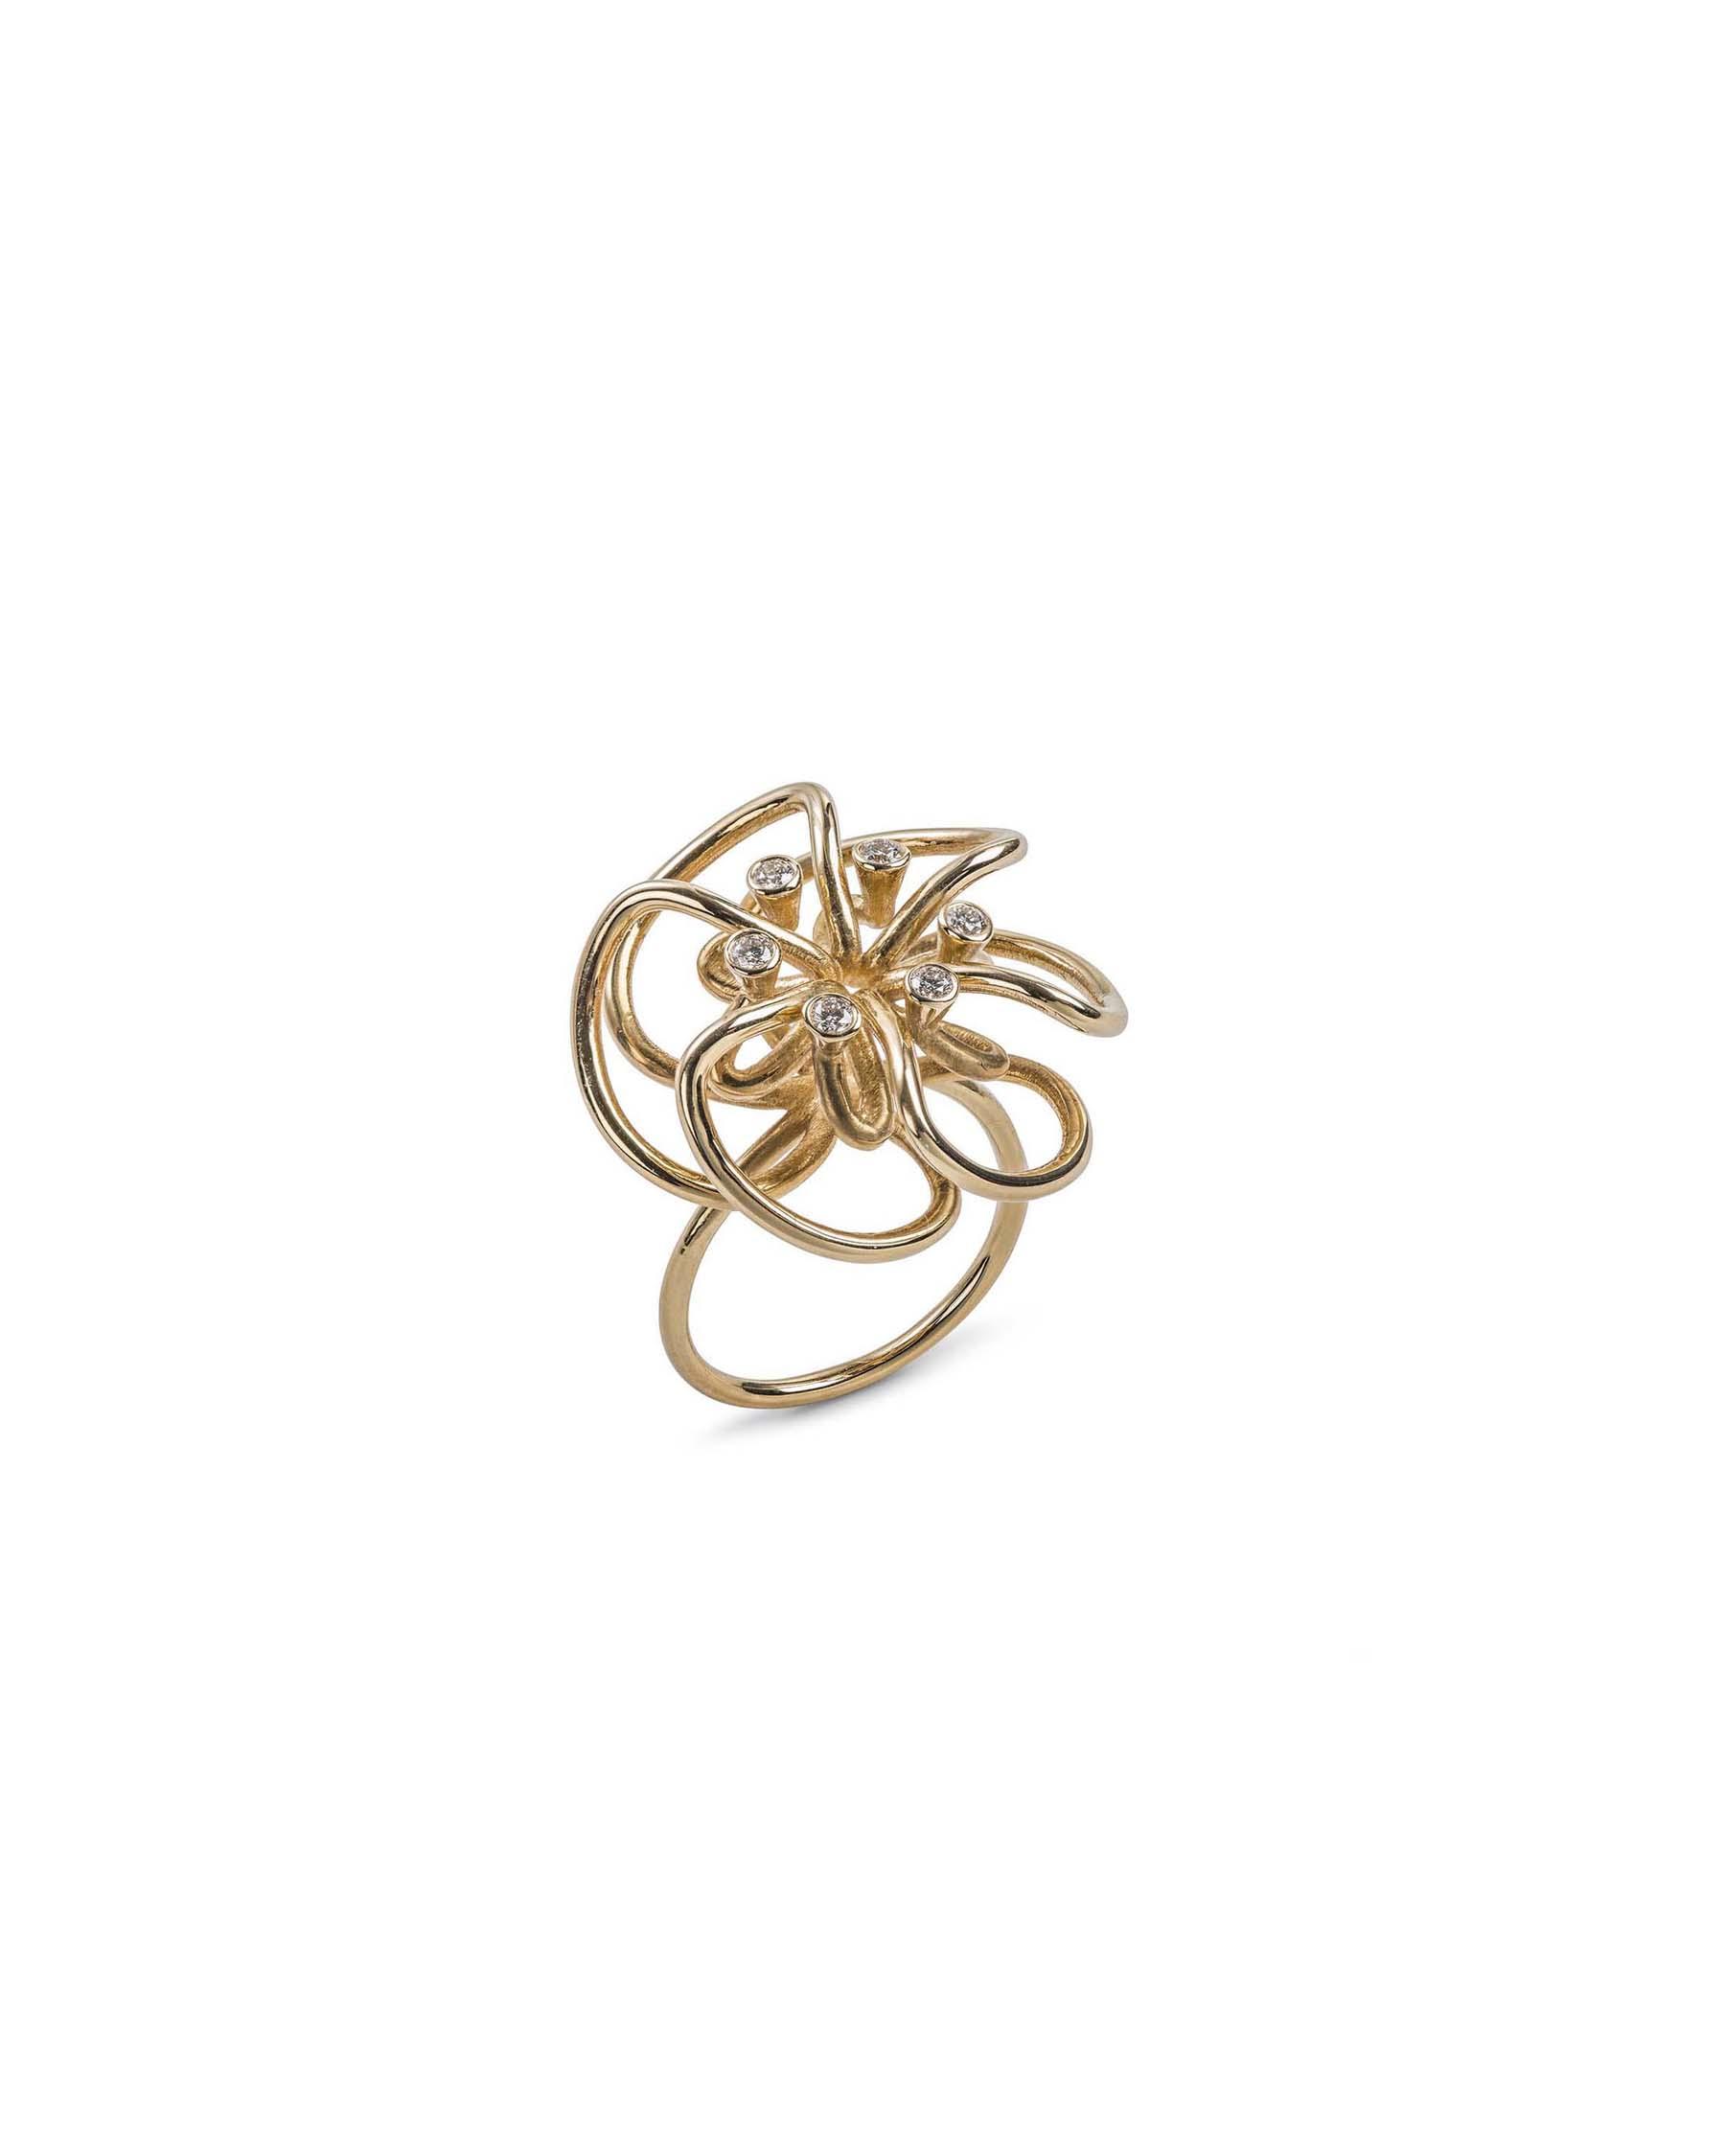 Gold flower knot ring